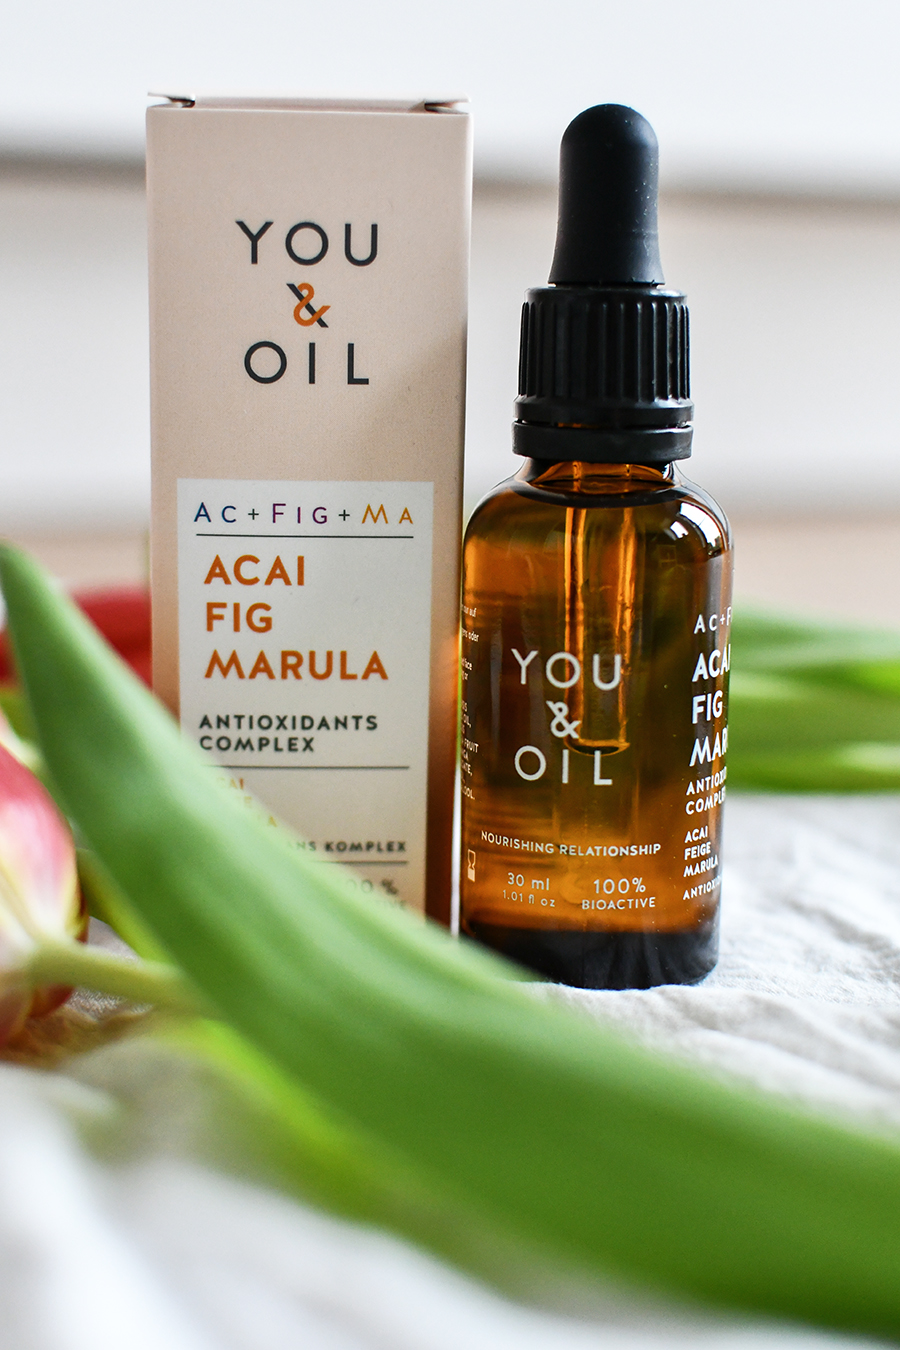 You and Oil Acai Fig Marula Serum Geischtspflege